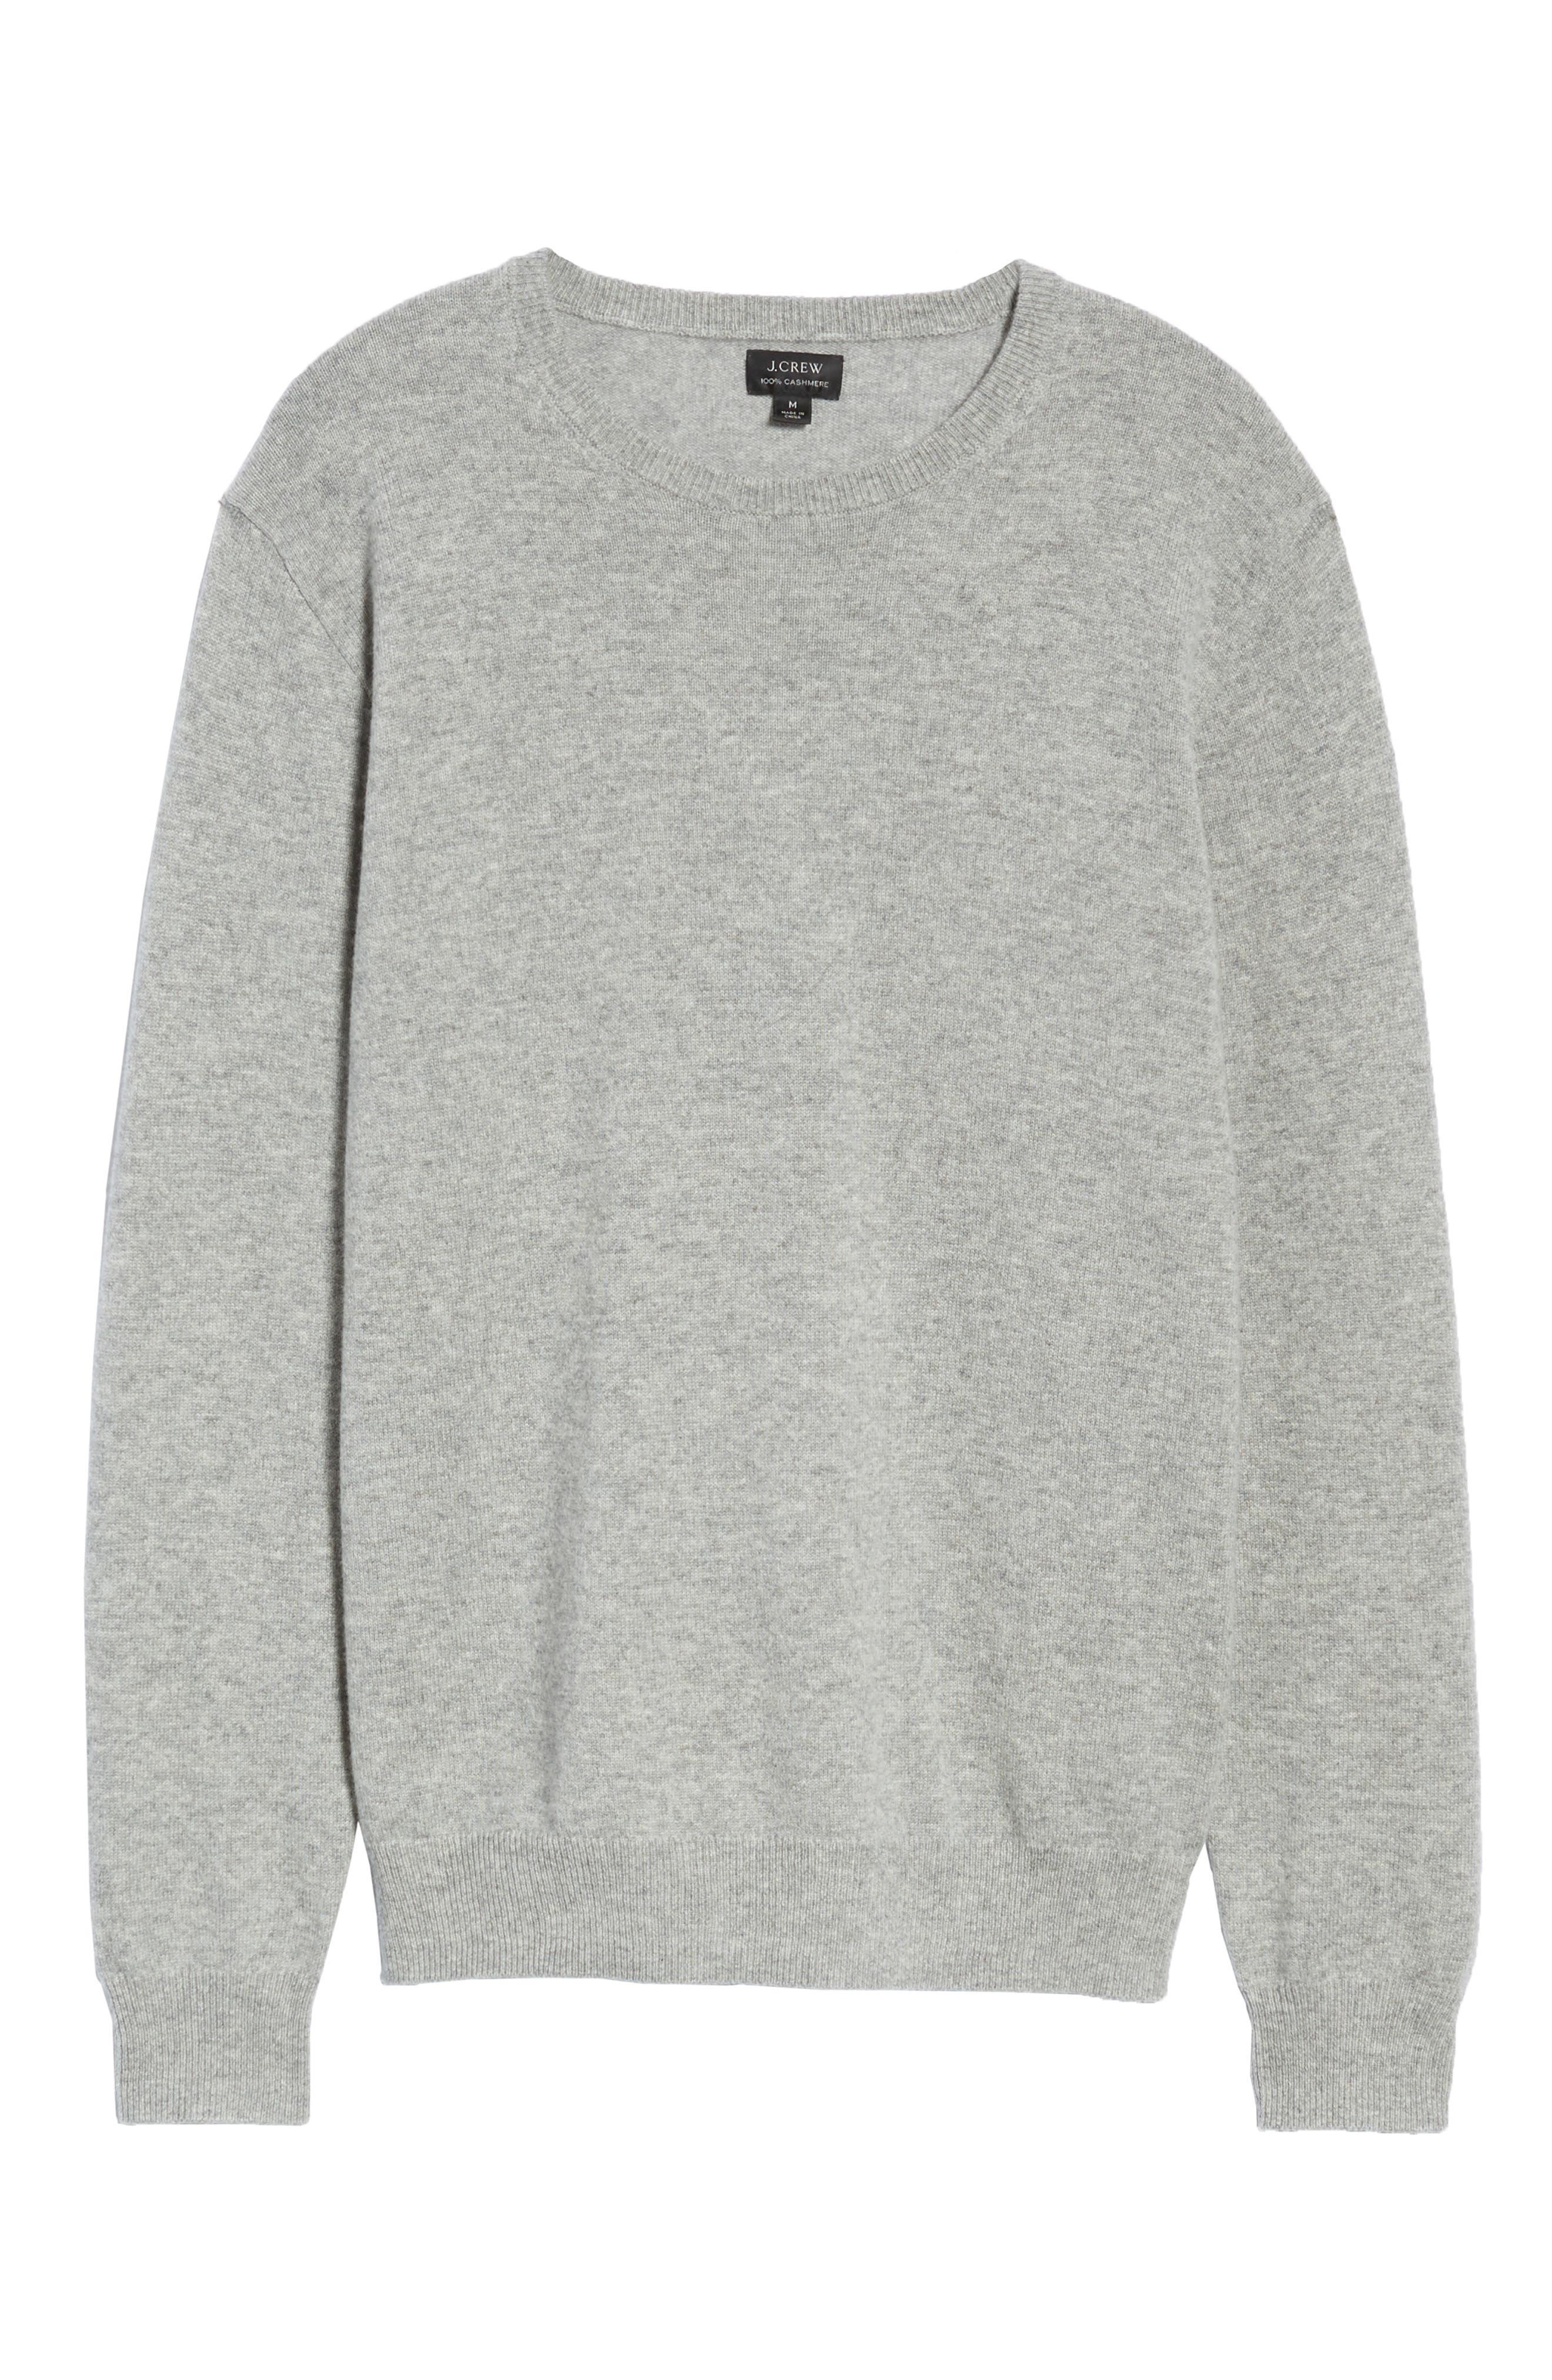 Everyday Cashmere Regular Fit Crewneck Sweater,                             Alternate thumbnail 6, color,                             HEATHER GREY